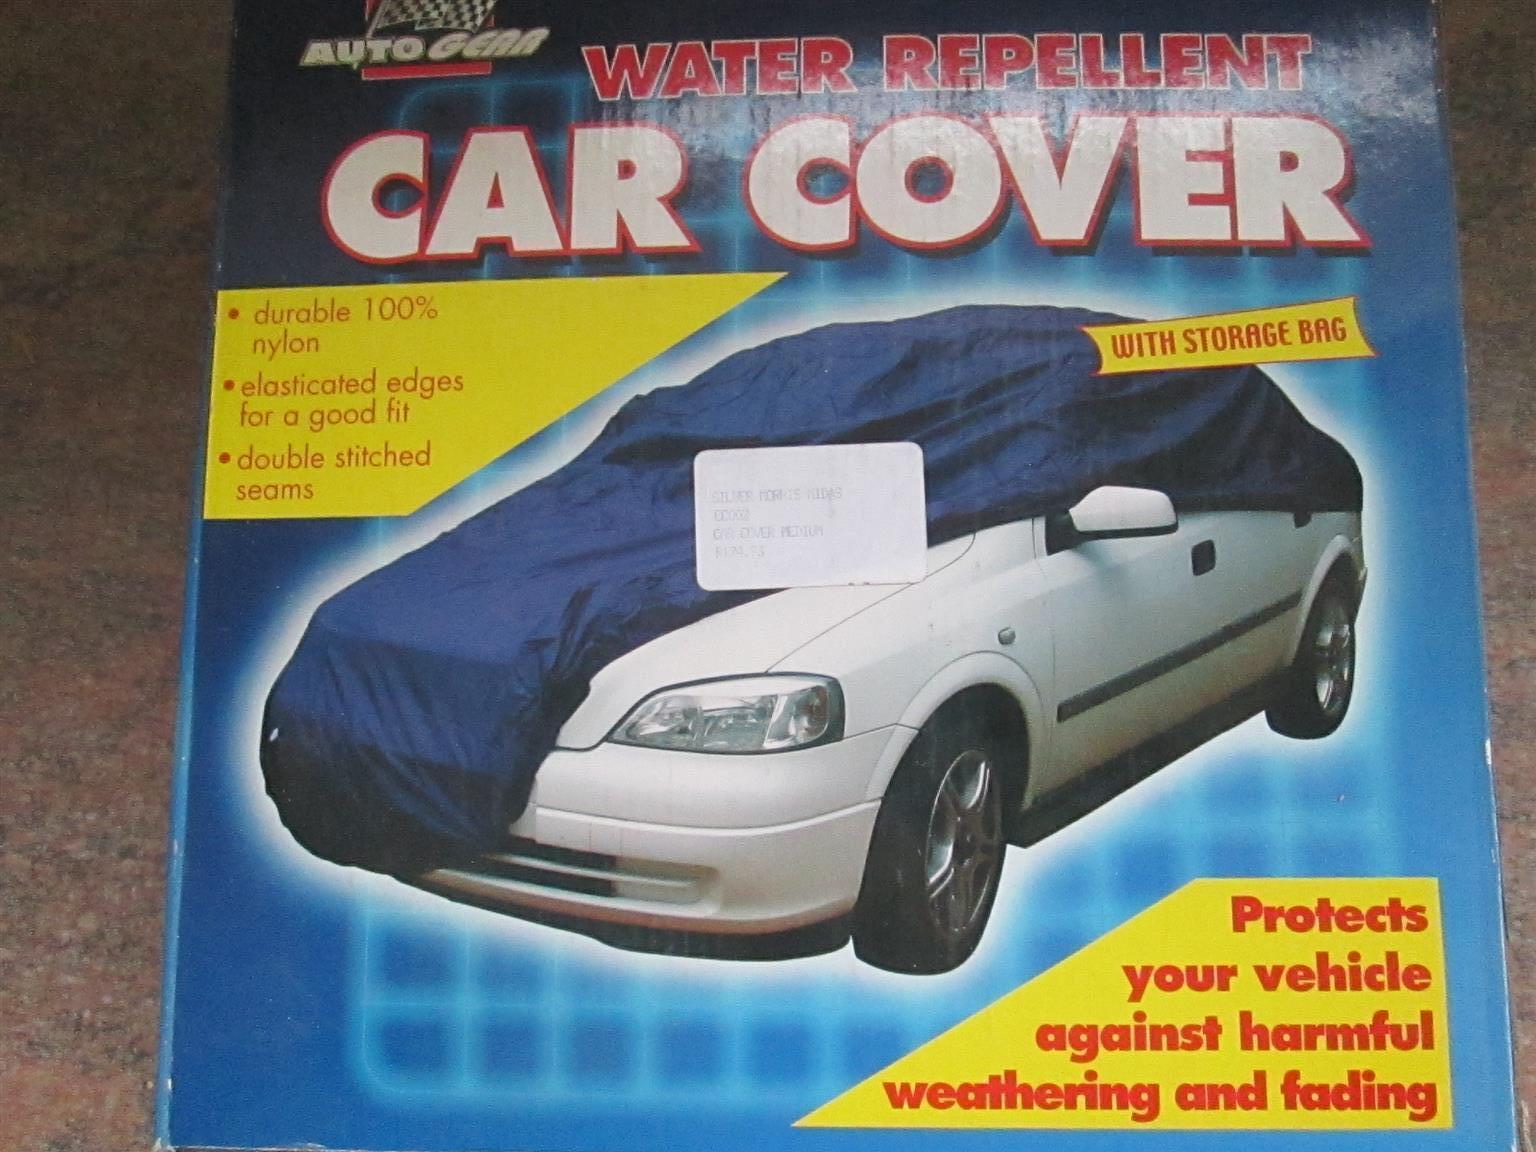 auto gear water repellent car cover